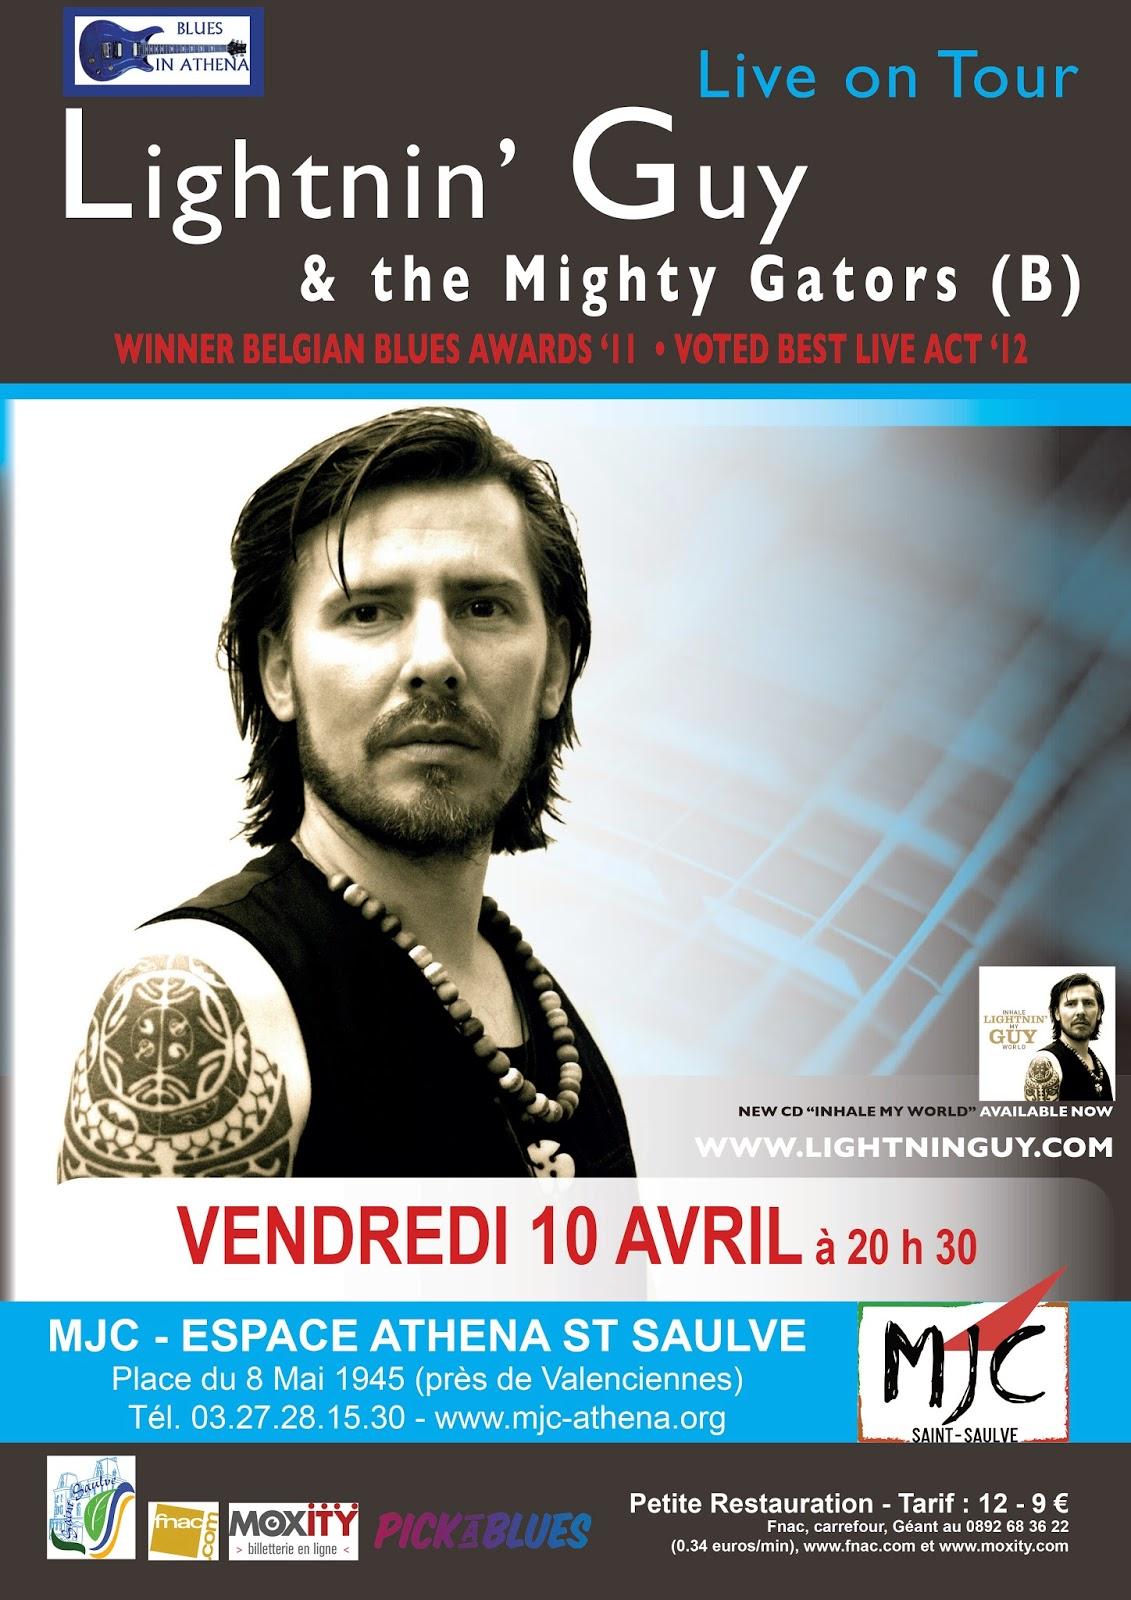 http://bluesinathena.blogspot.fr/2015/02/lightnin-guy-verlinde-mighty-gators-10.html